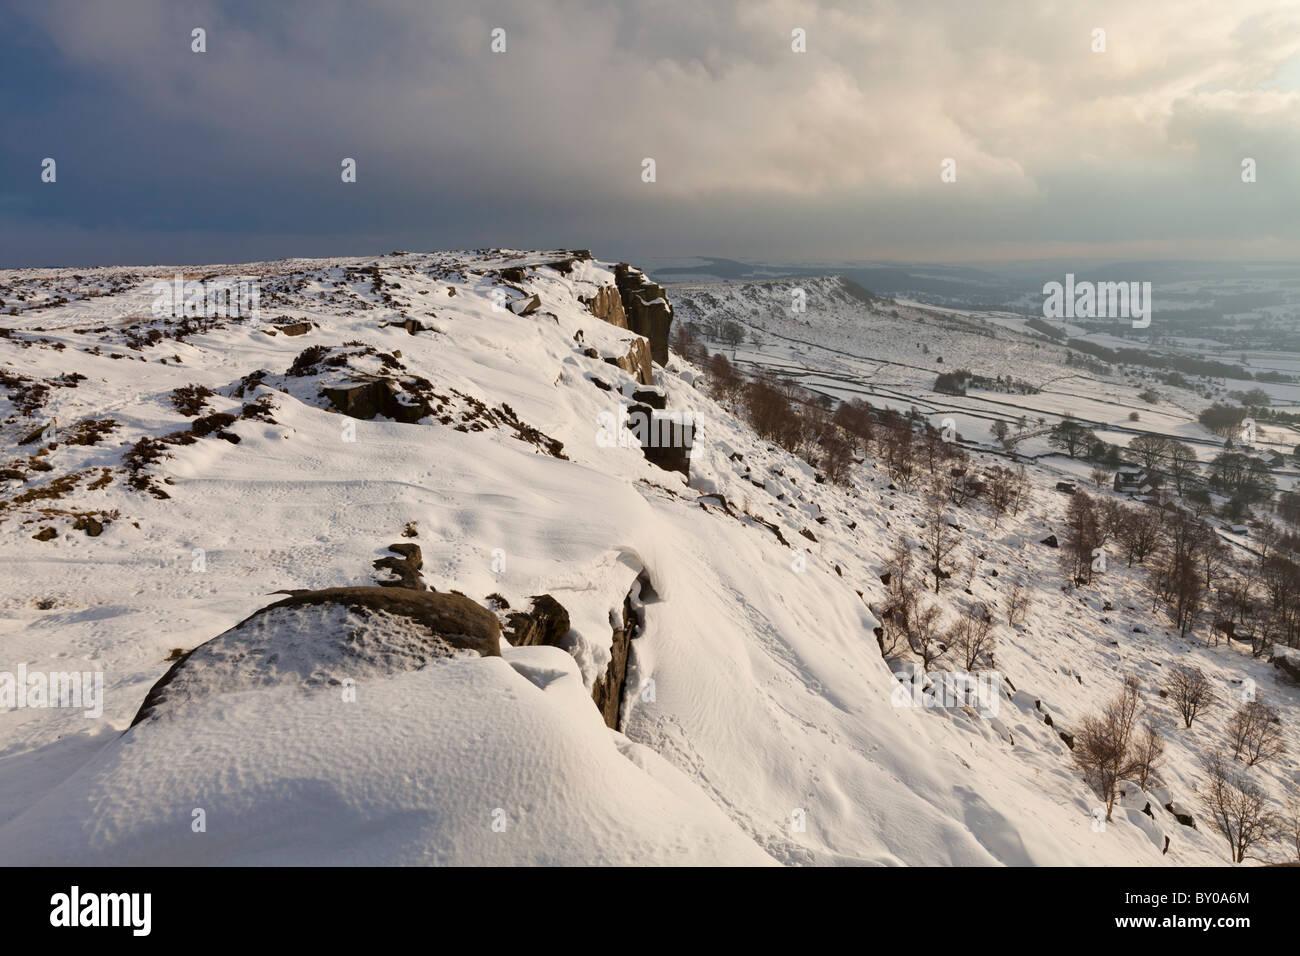 Froggatt edge countryside in the snow Derbyshire England GB UK EU Europe - Stock Image